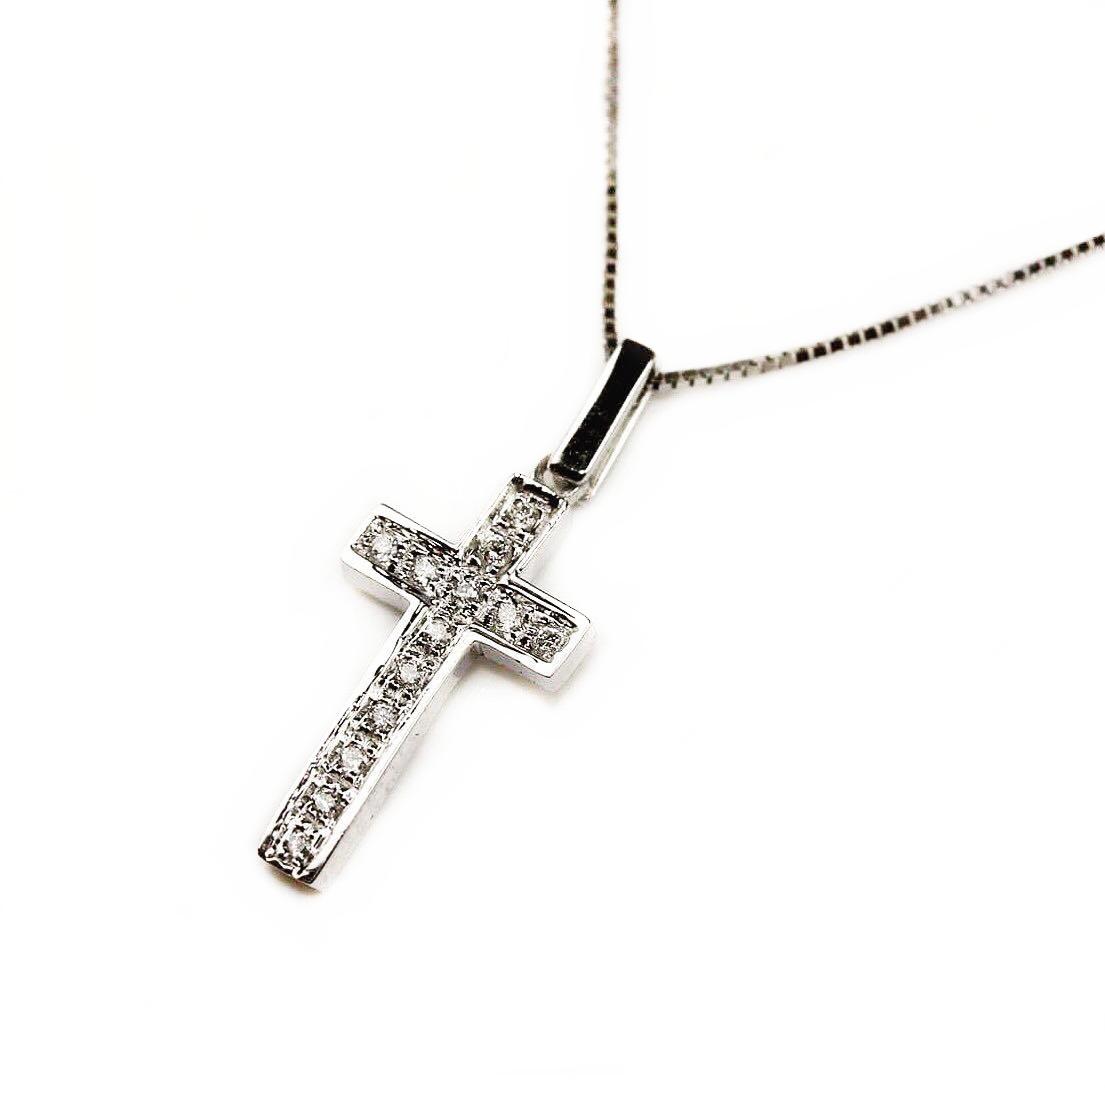 Lan Din Aur Alb 18k Cu Pandantiv Cruciuli Cu Diamante